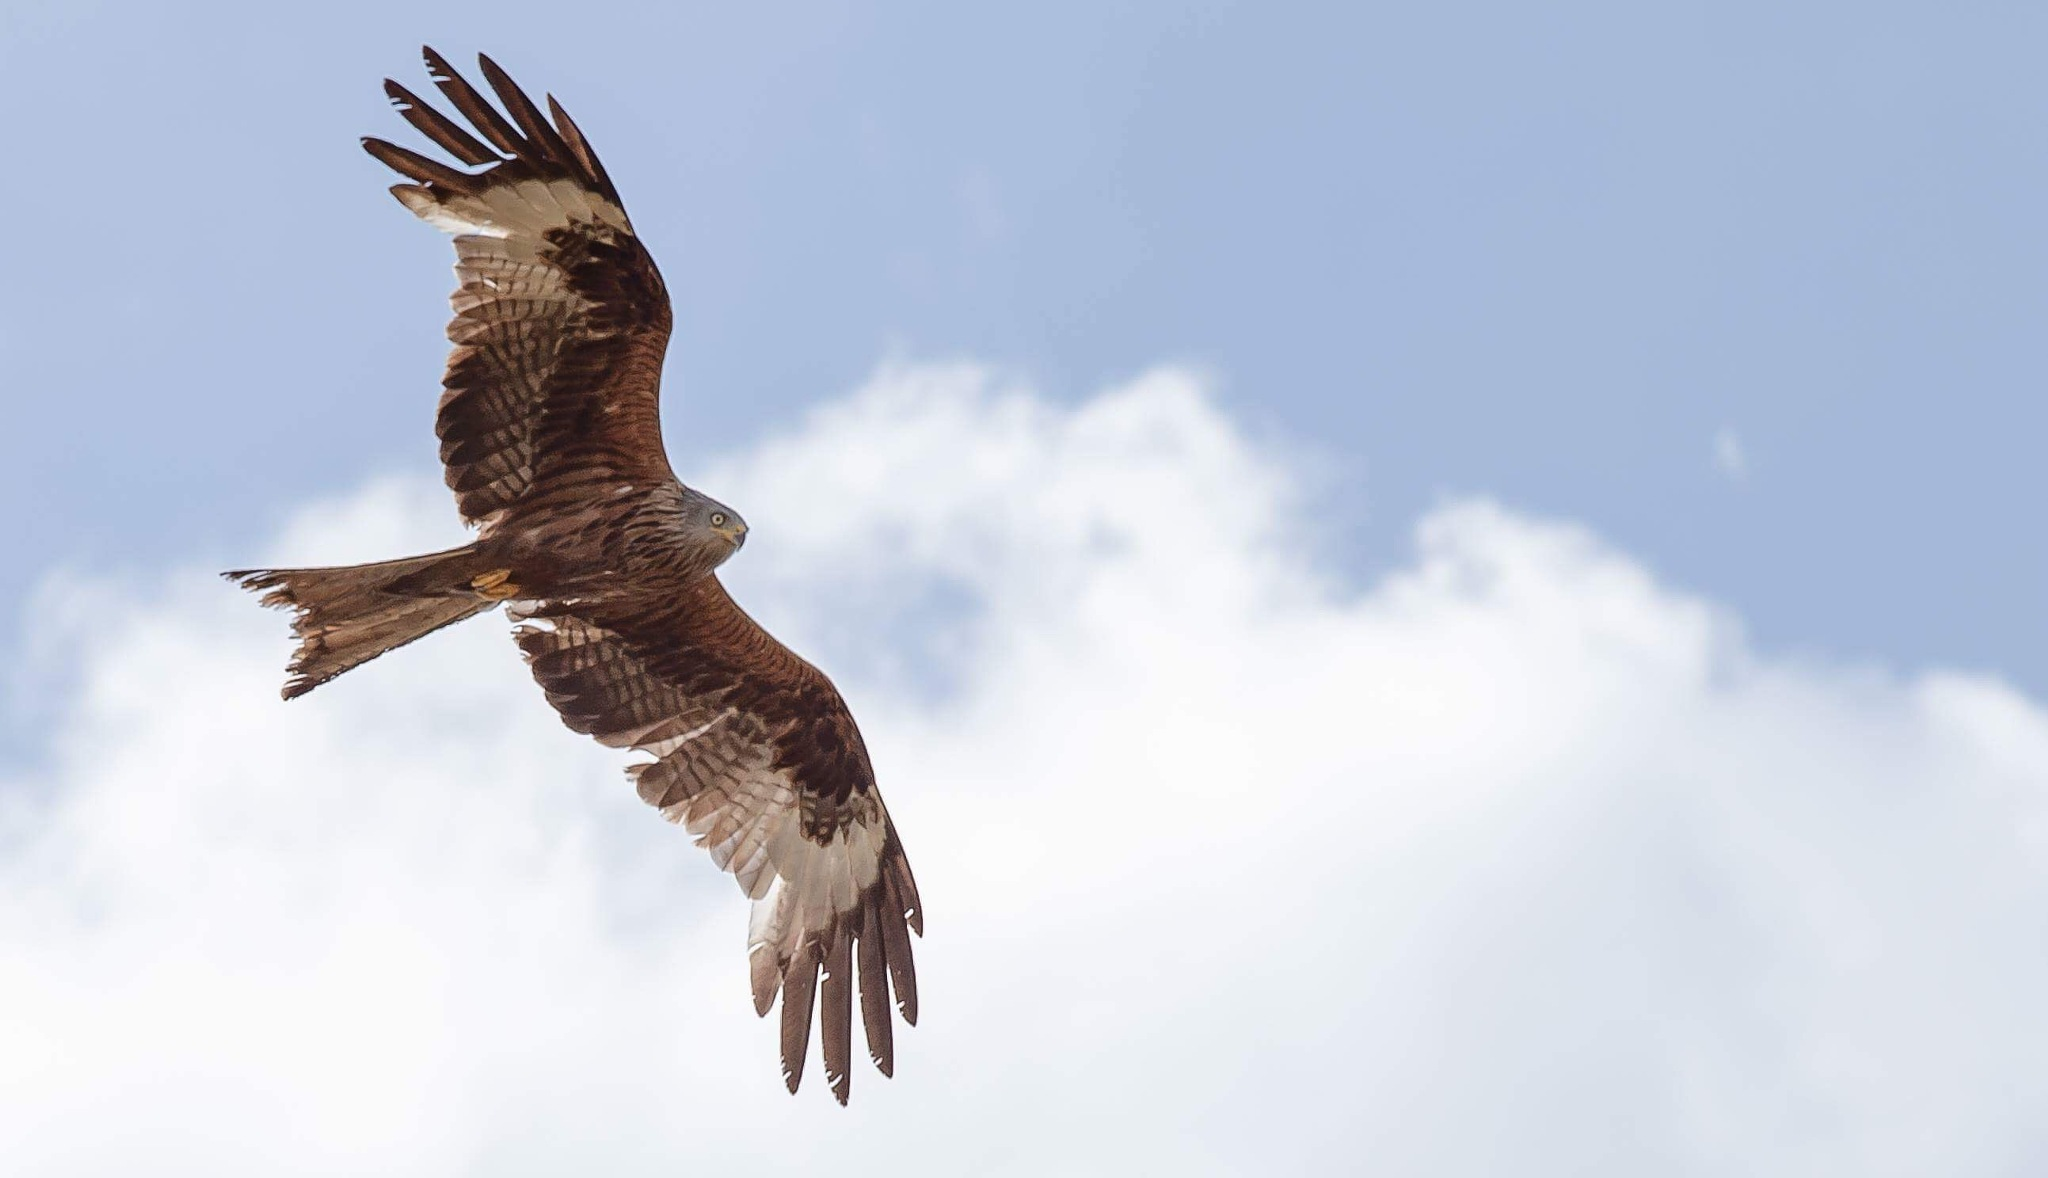 Bird Of Prey by Sedge Wilson